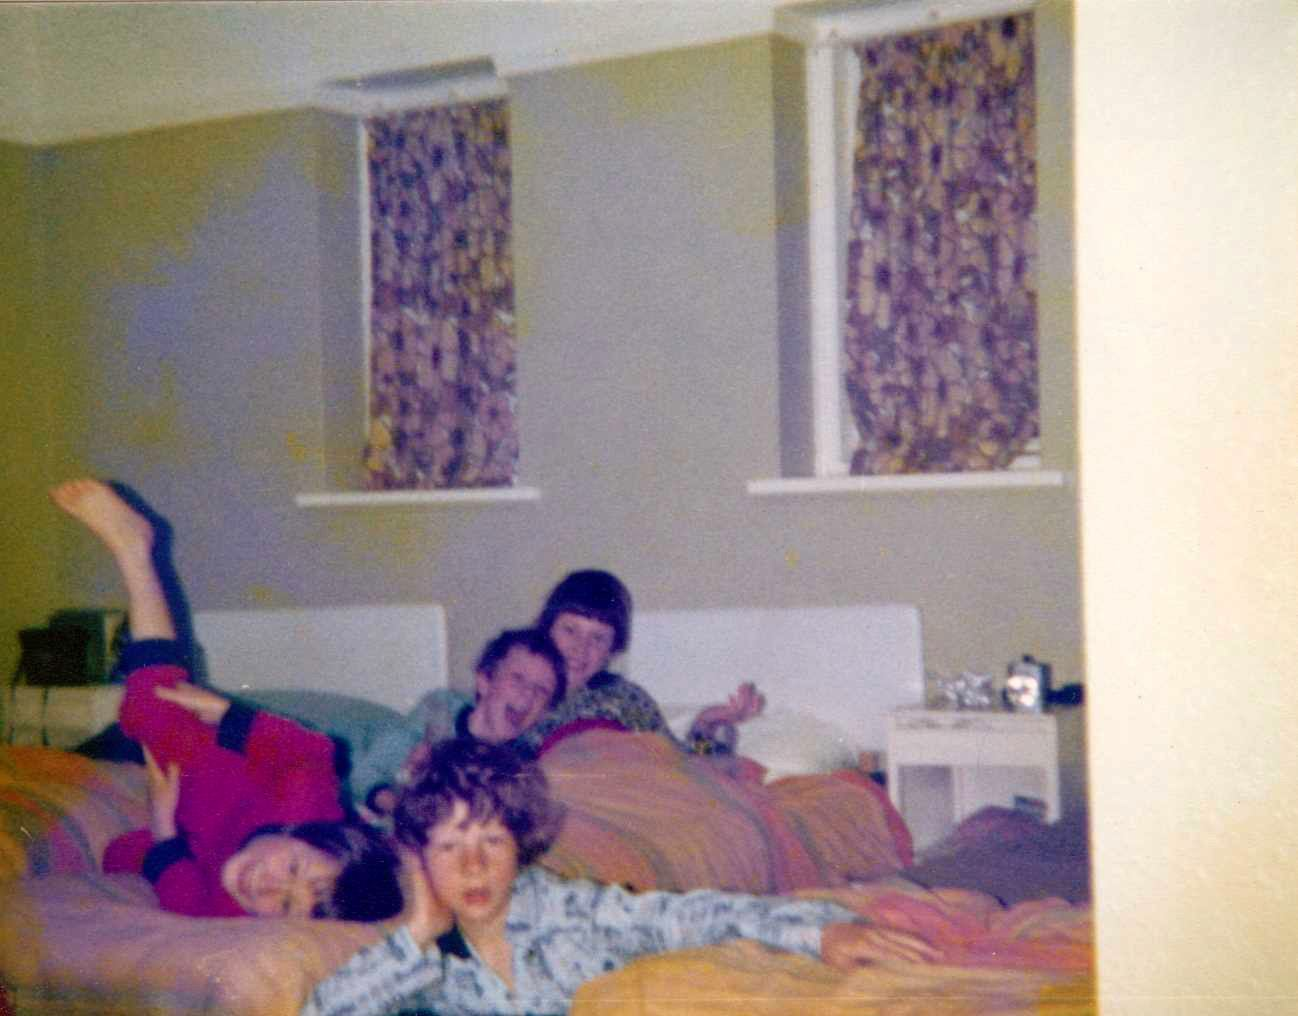 c. 1980 Barnes Close. ? Stillman, Simon Day, Nicholas Taylor and Gary Harrison.